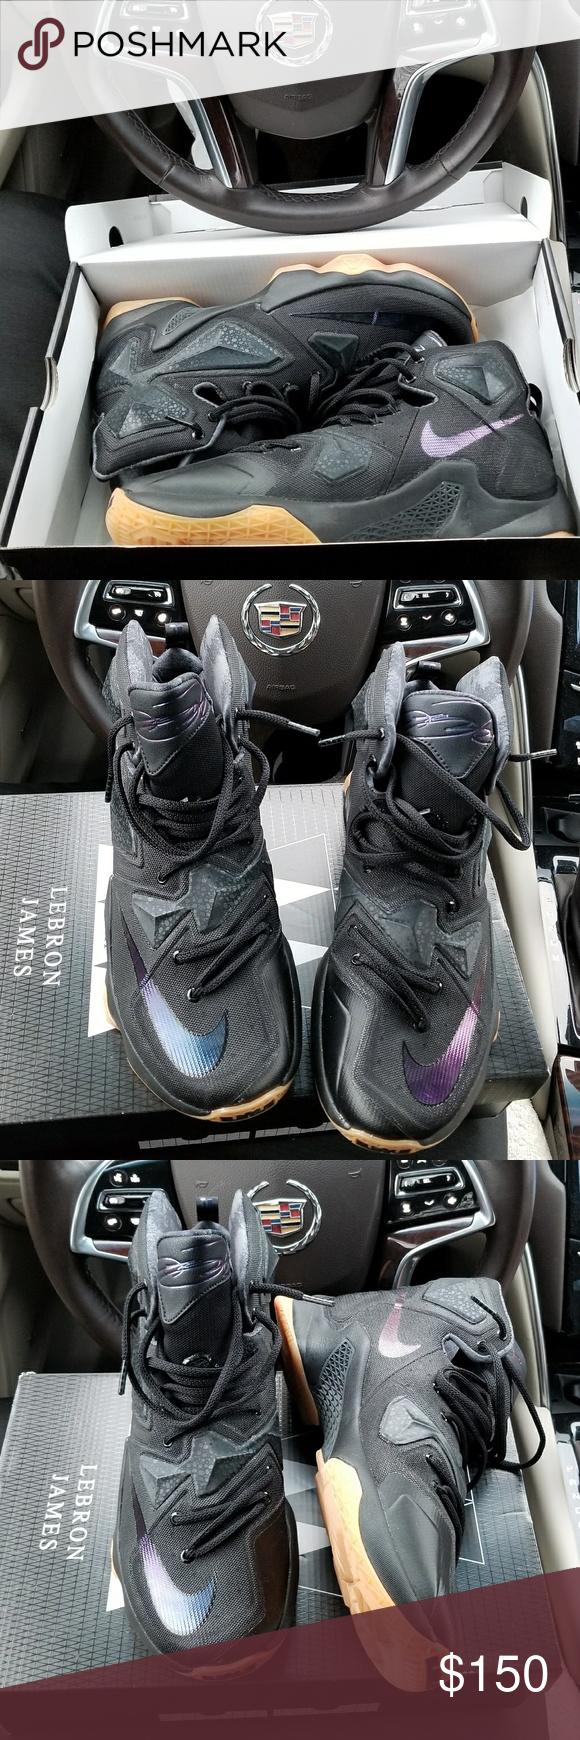 hot sale online 3e25e e8d10 LeBron 13 Black gum bottom (like new worn once) Nike Shoes Athletic Shoes